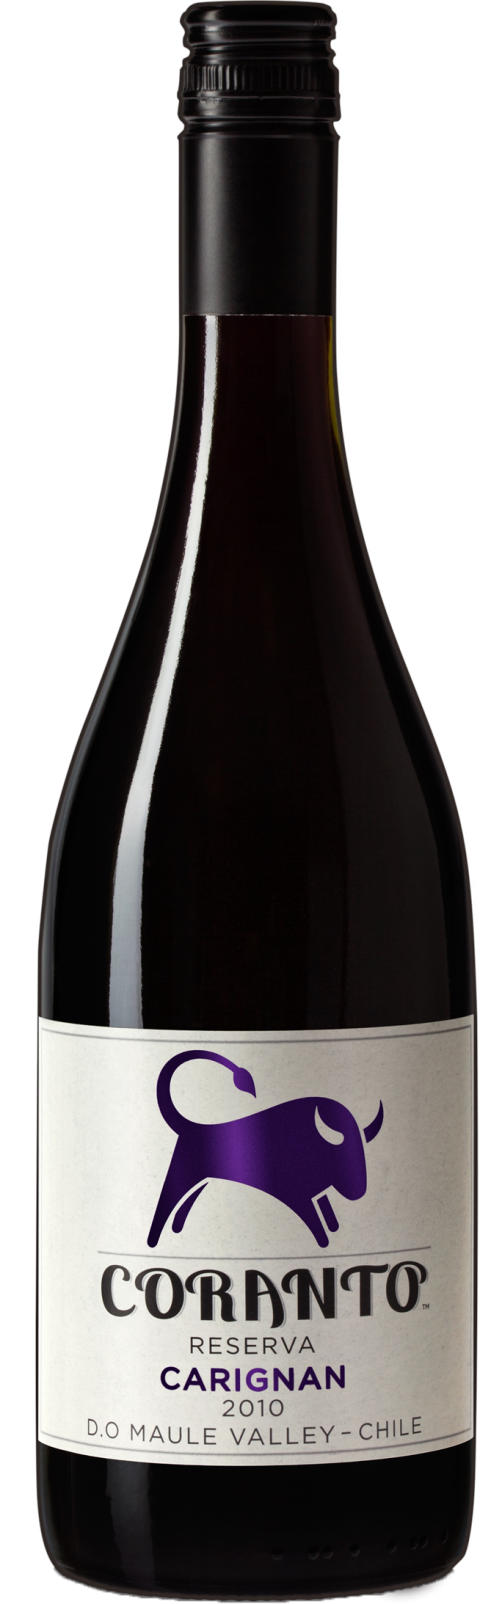 Coranto Reserva Carignan 2010 – en vällagrad carignan visar Chiles bredd som vinland